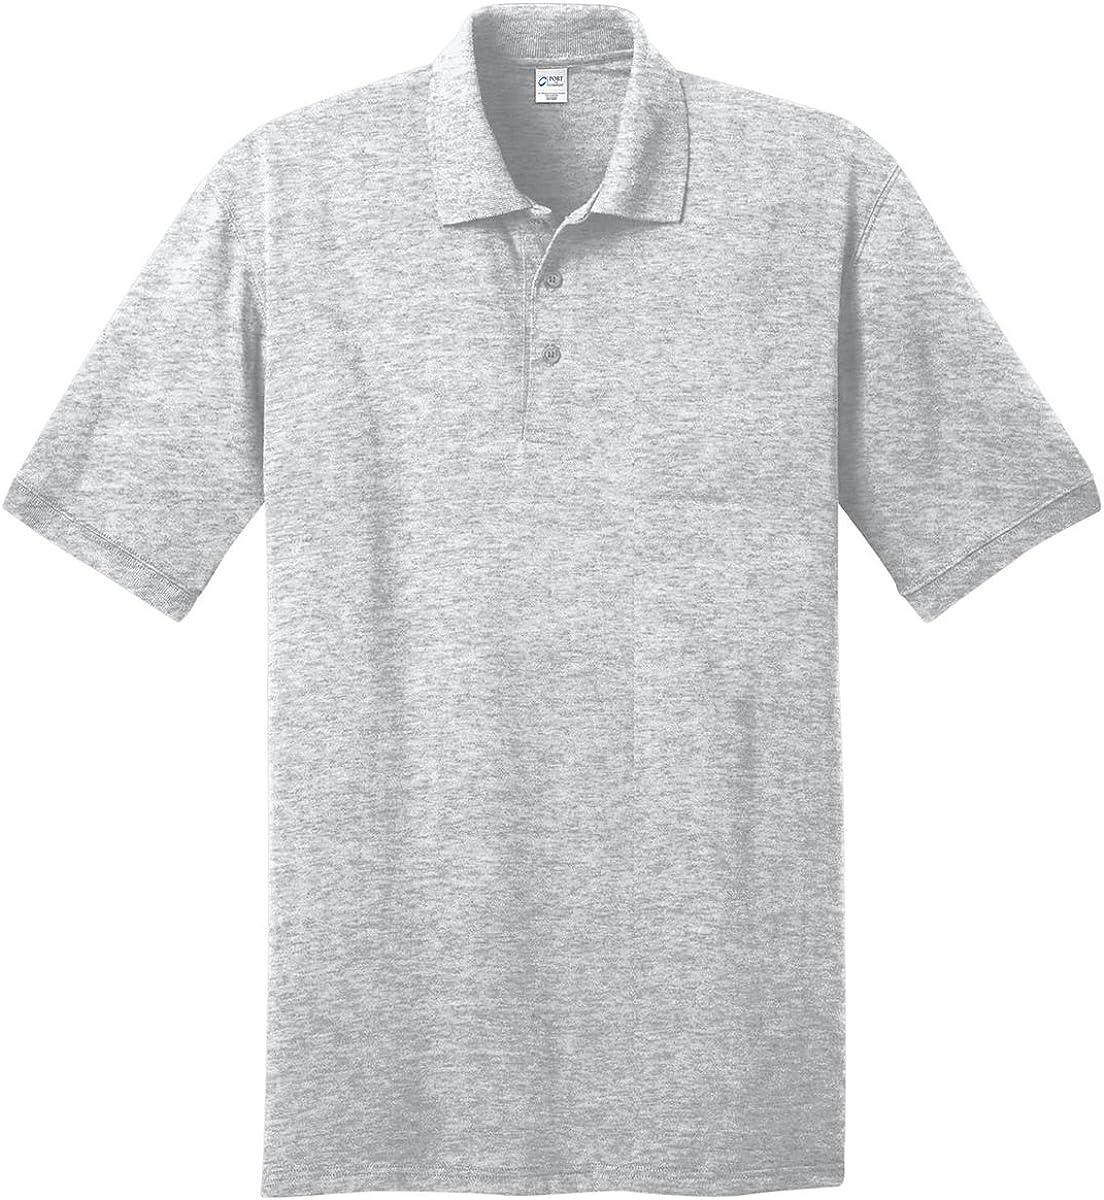 Port & Company Tall 5.5-Ounce Jersey Knit Polo Shirt, Ash, Large Tall